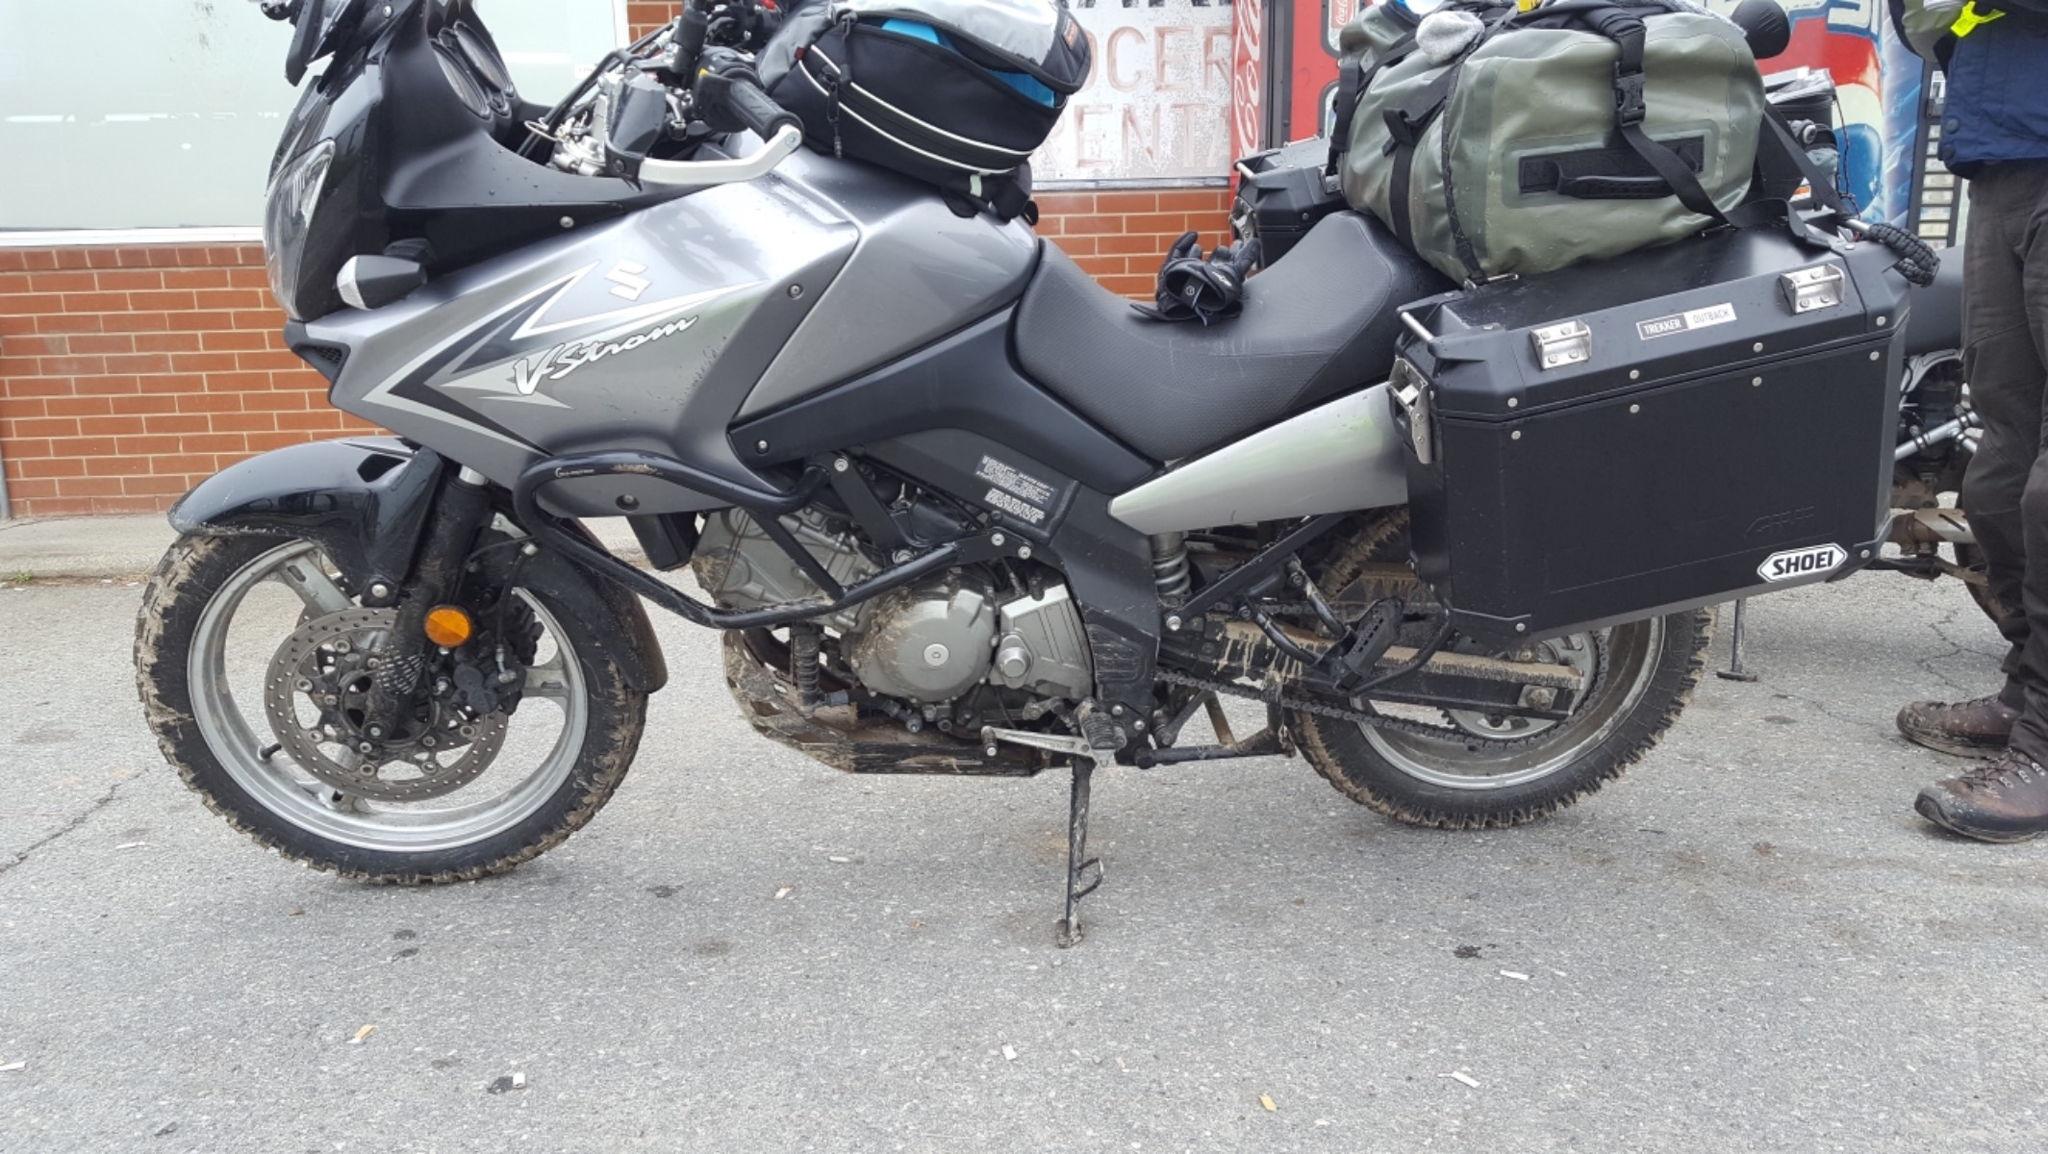 Suzuki V Strom 650 For Rent Near Linden Nj Riders Share